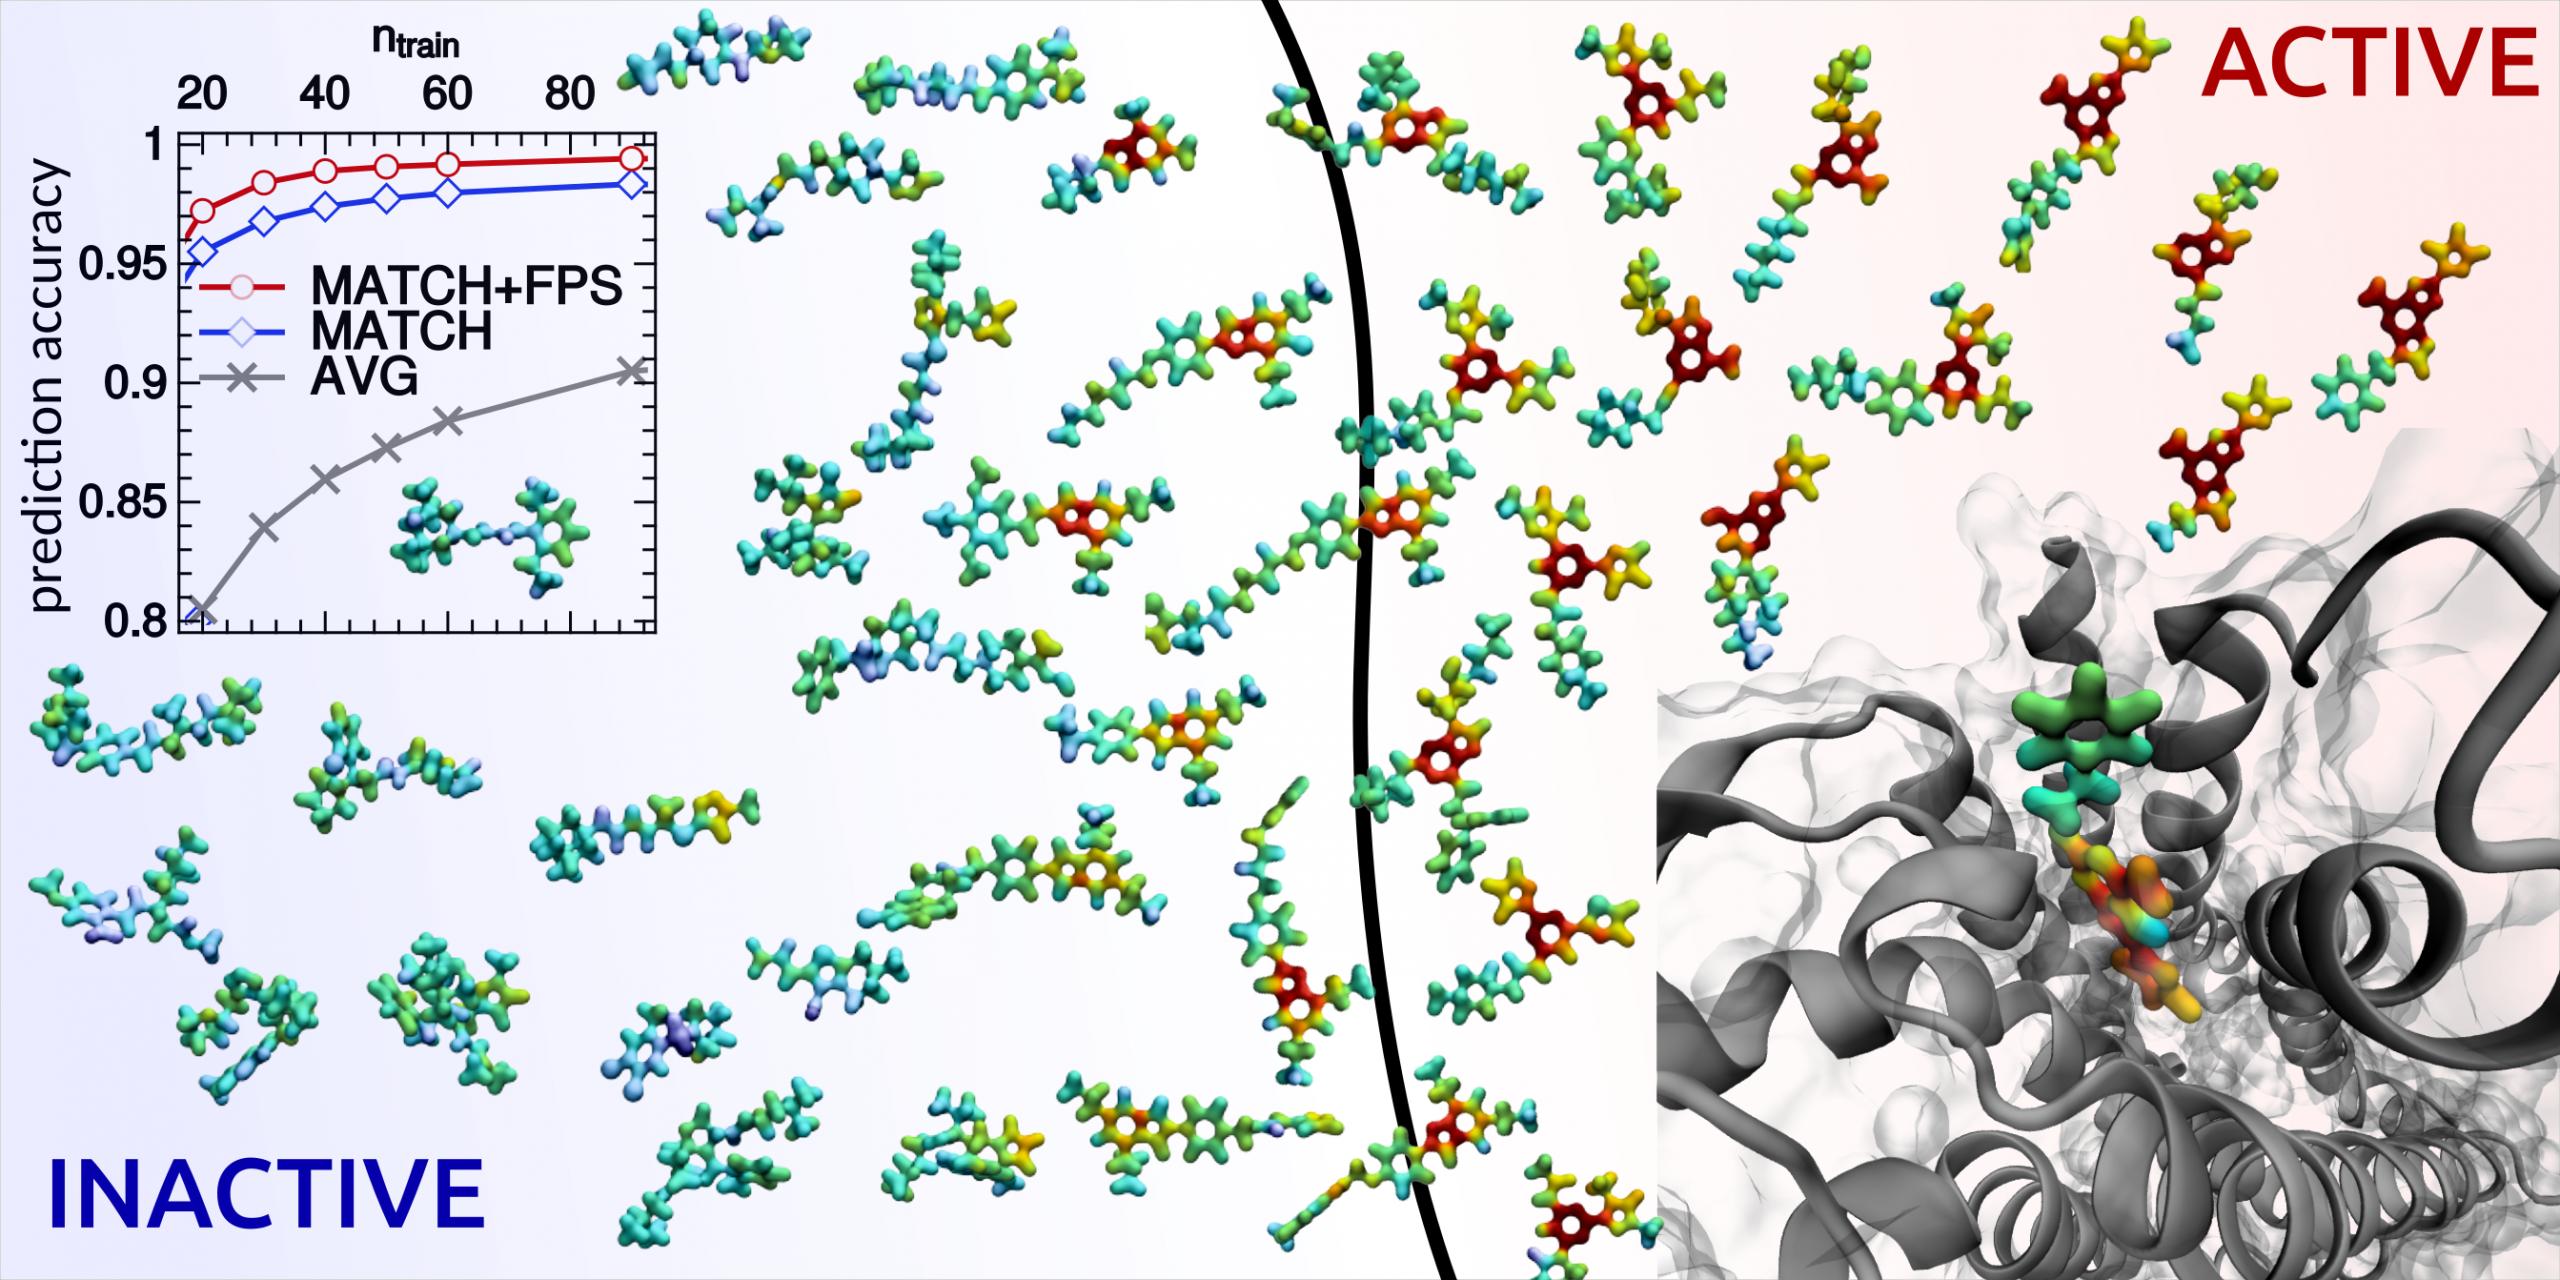 Figure representing a series of drug molecules